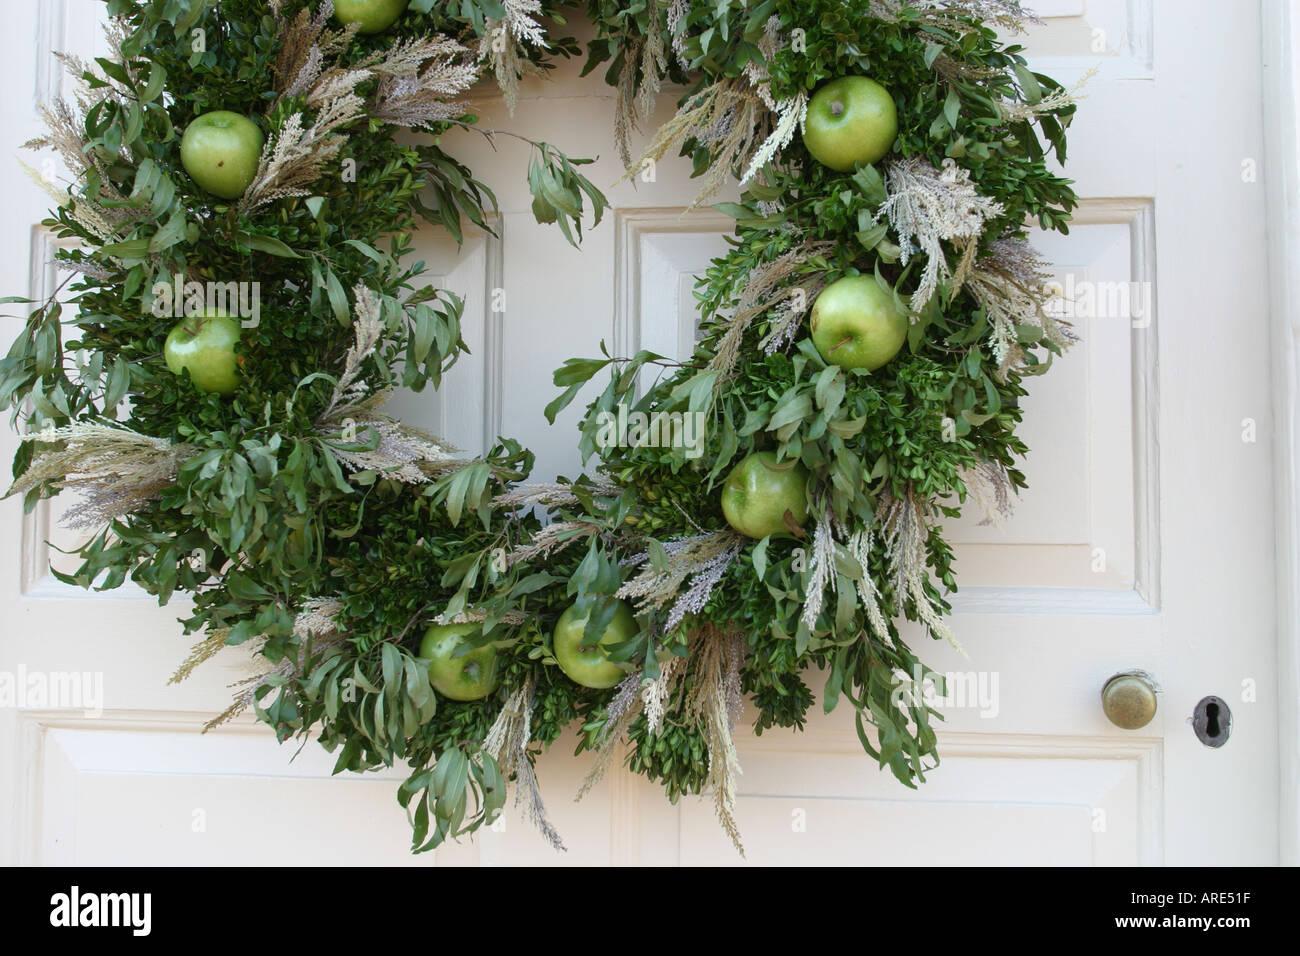 virginia colonial national historical park yorktown main street nelson house colonial christmas decor front door